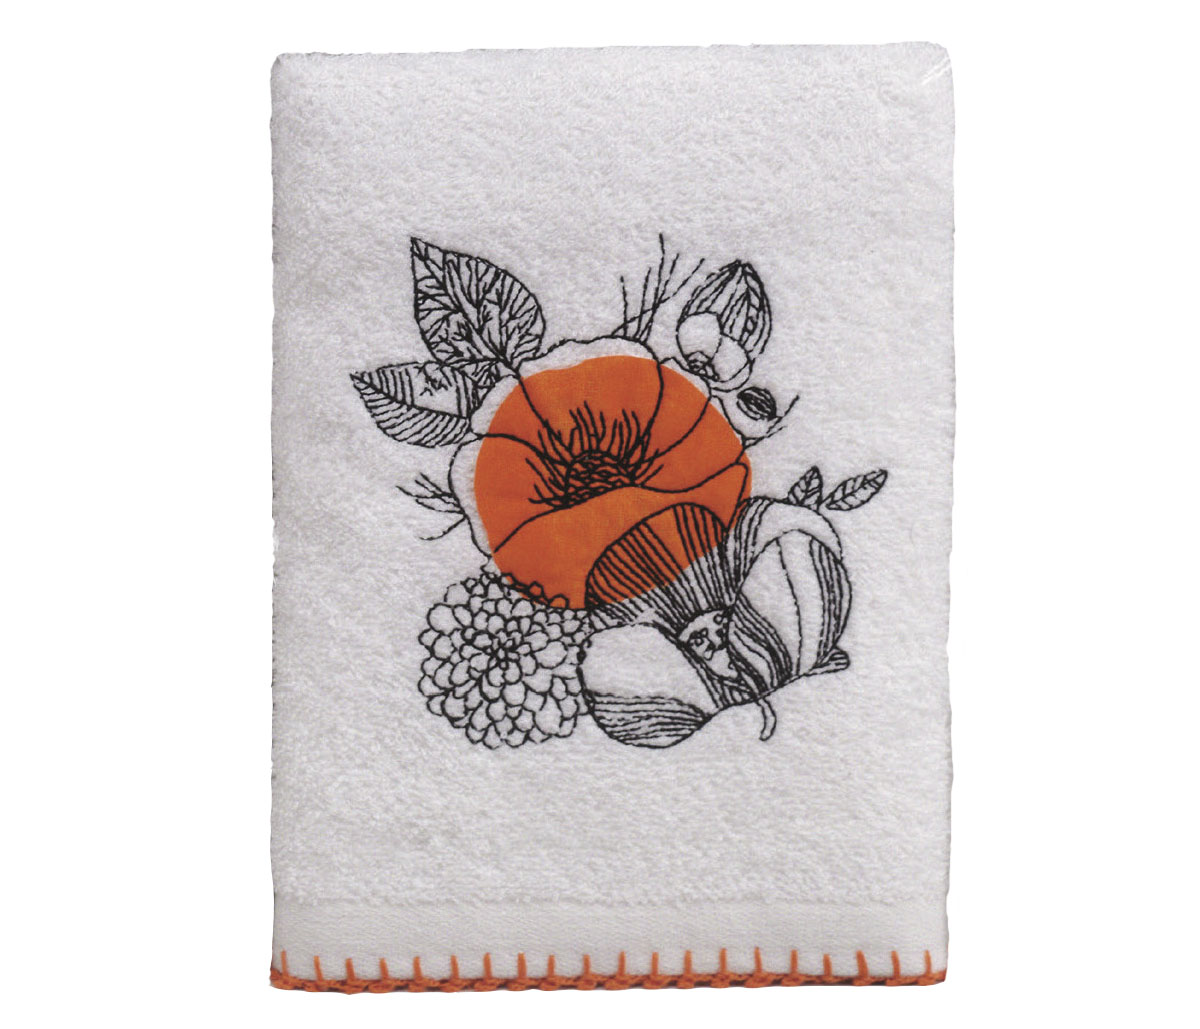 Кухонное полотенце Rayne Цвет: Белый, Оранжевый (50х70 см)